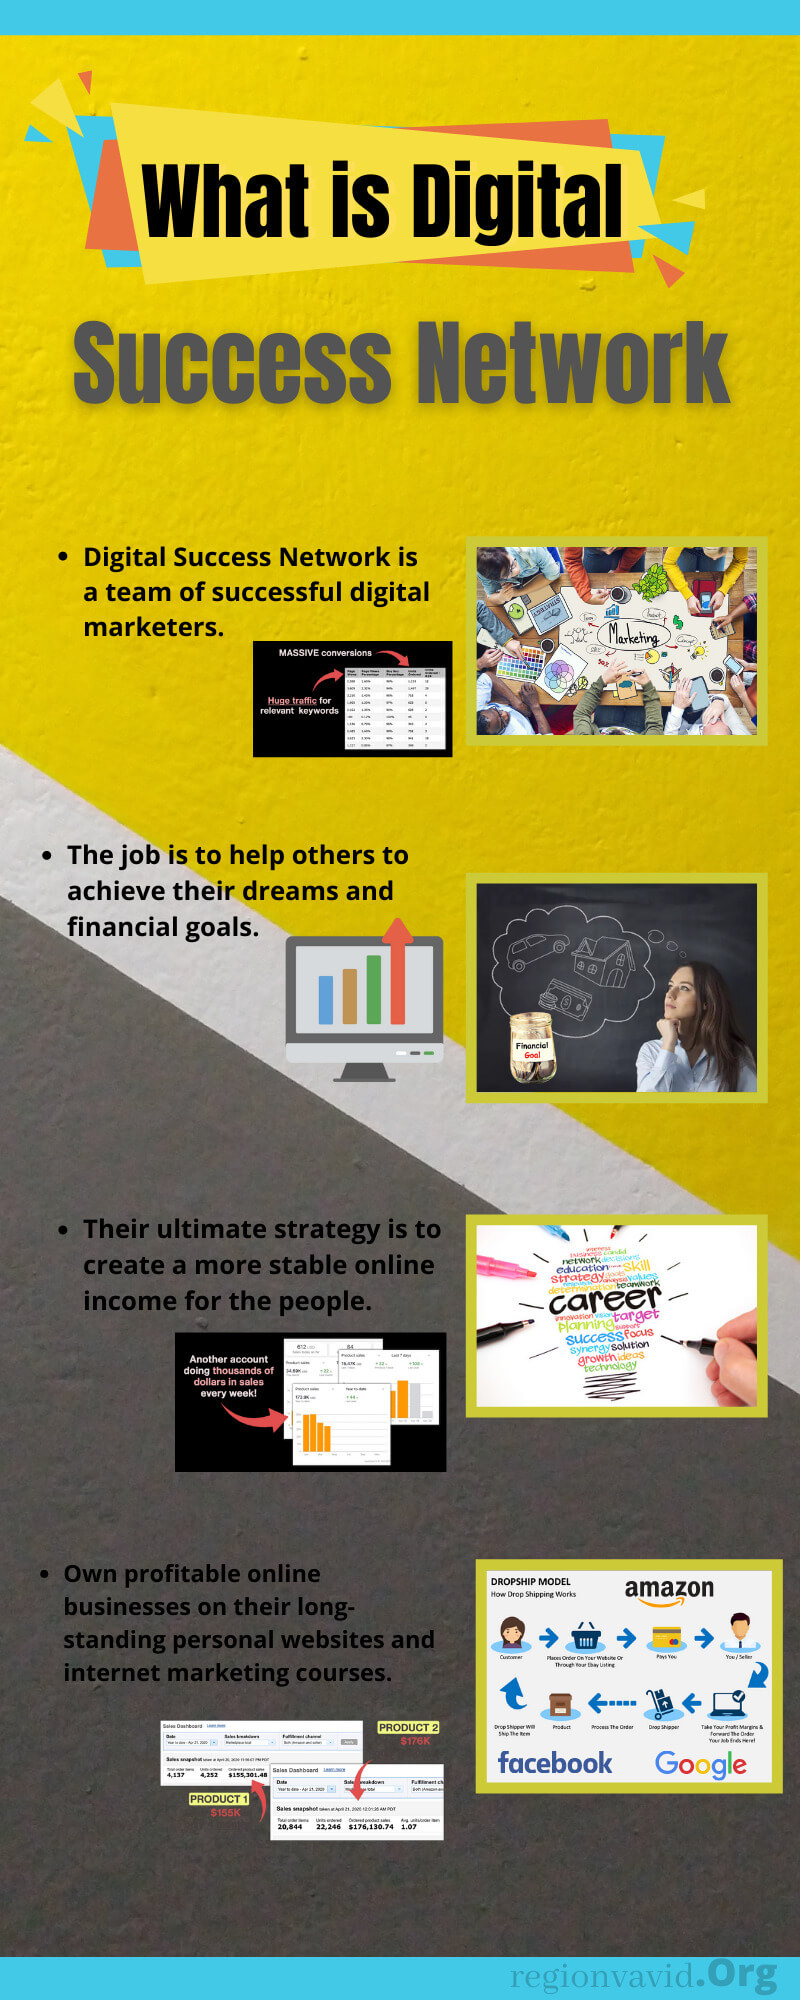 Digital Success Network Product explanation